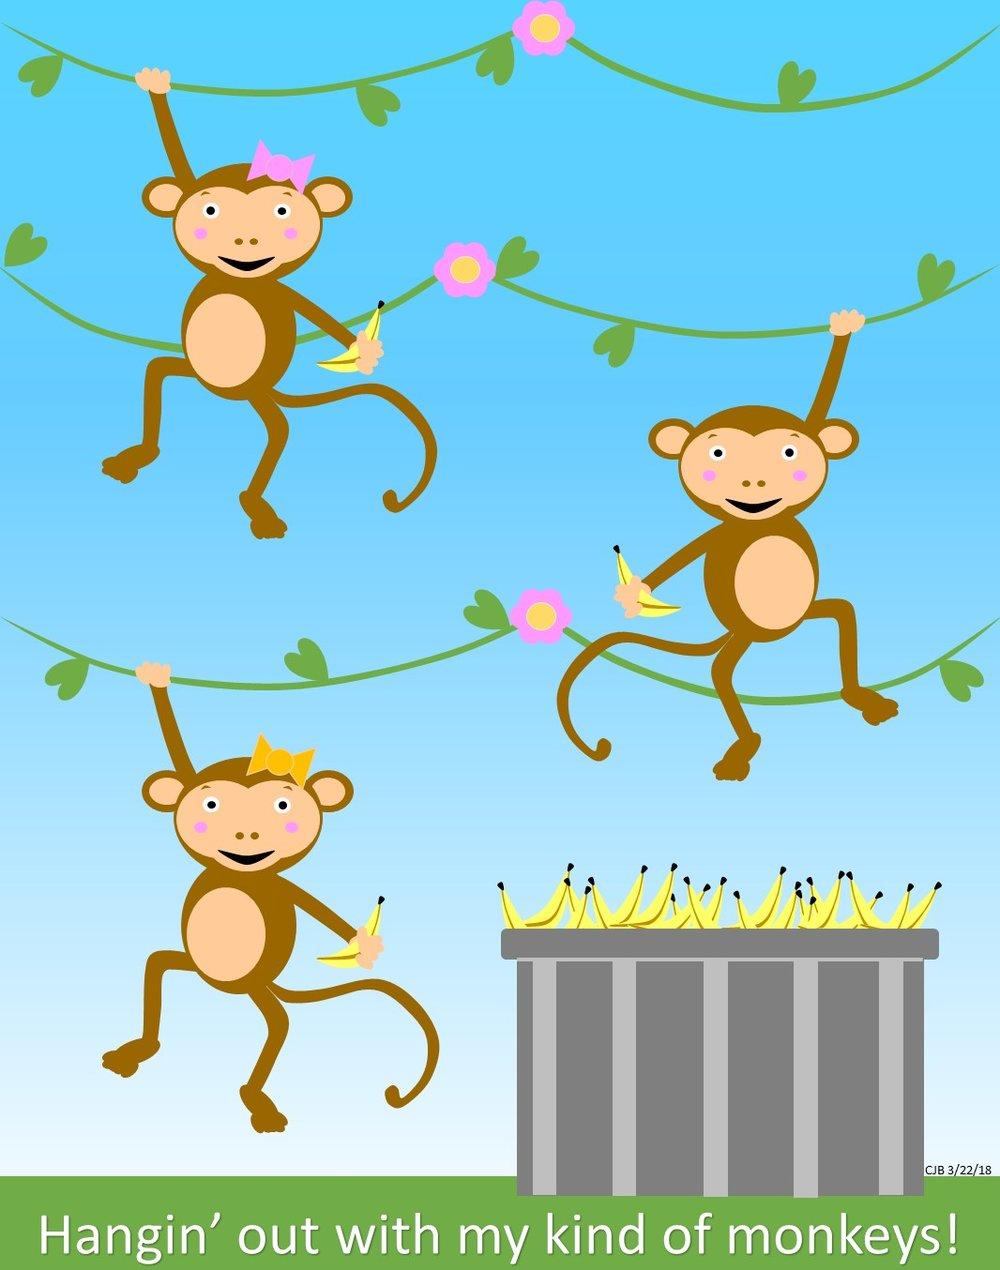 Carolyn Braden My Kind of Monkeys.jpg